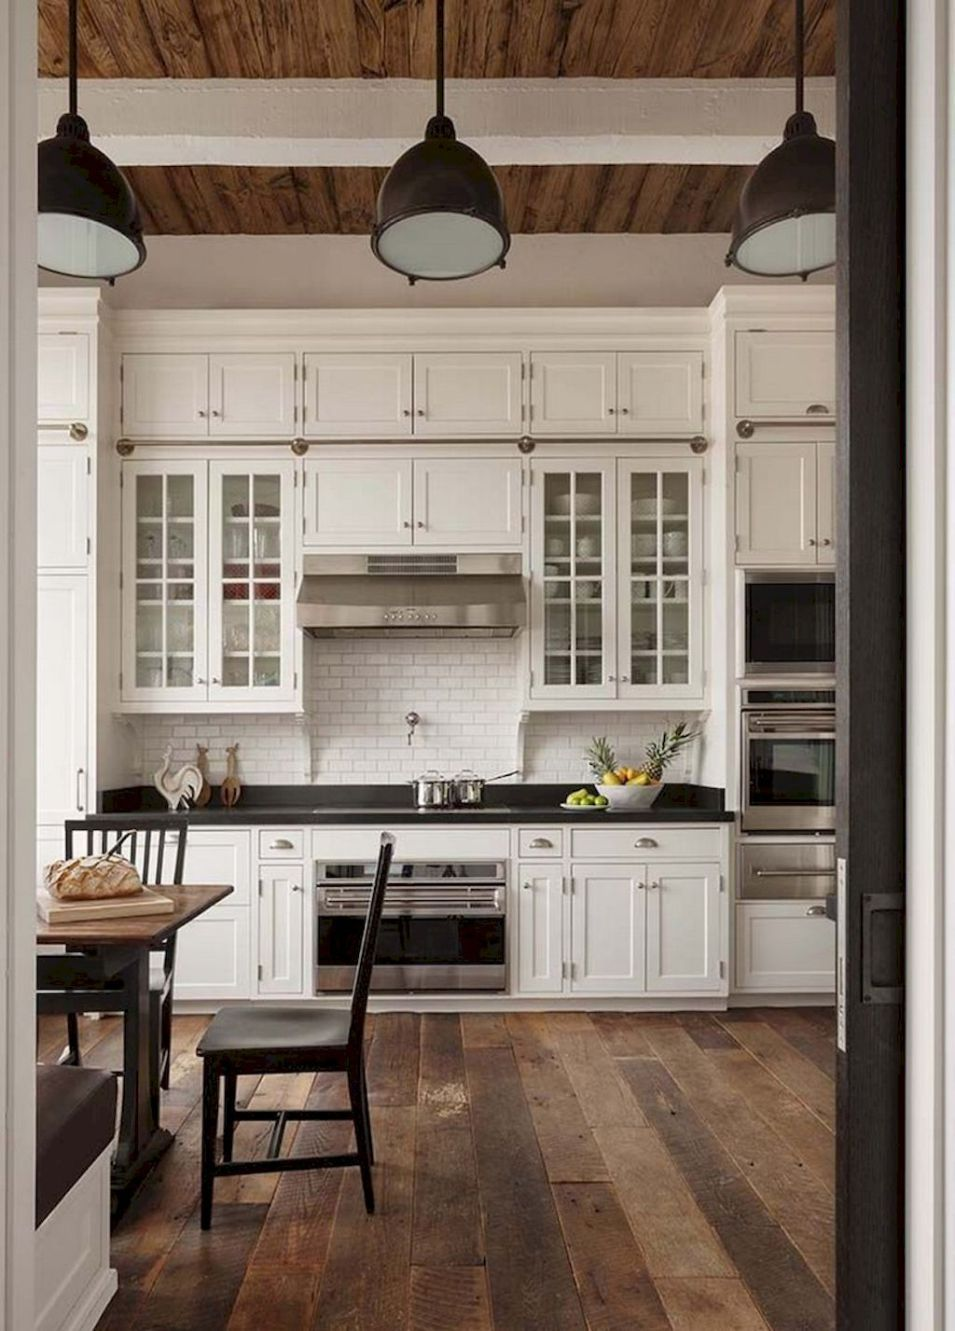 affordable farmhouse kitchen ideas on a budget 37 love of white kitchens modern farmhouse on kitchen ideas on a budget id=49140